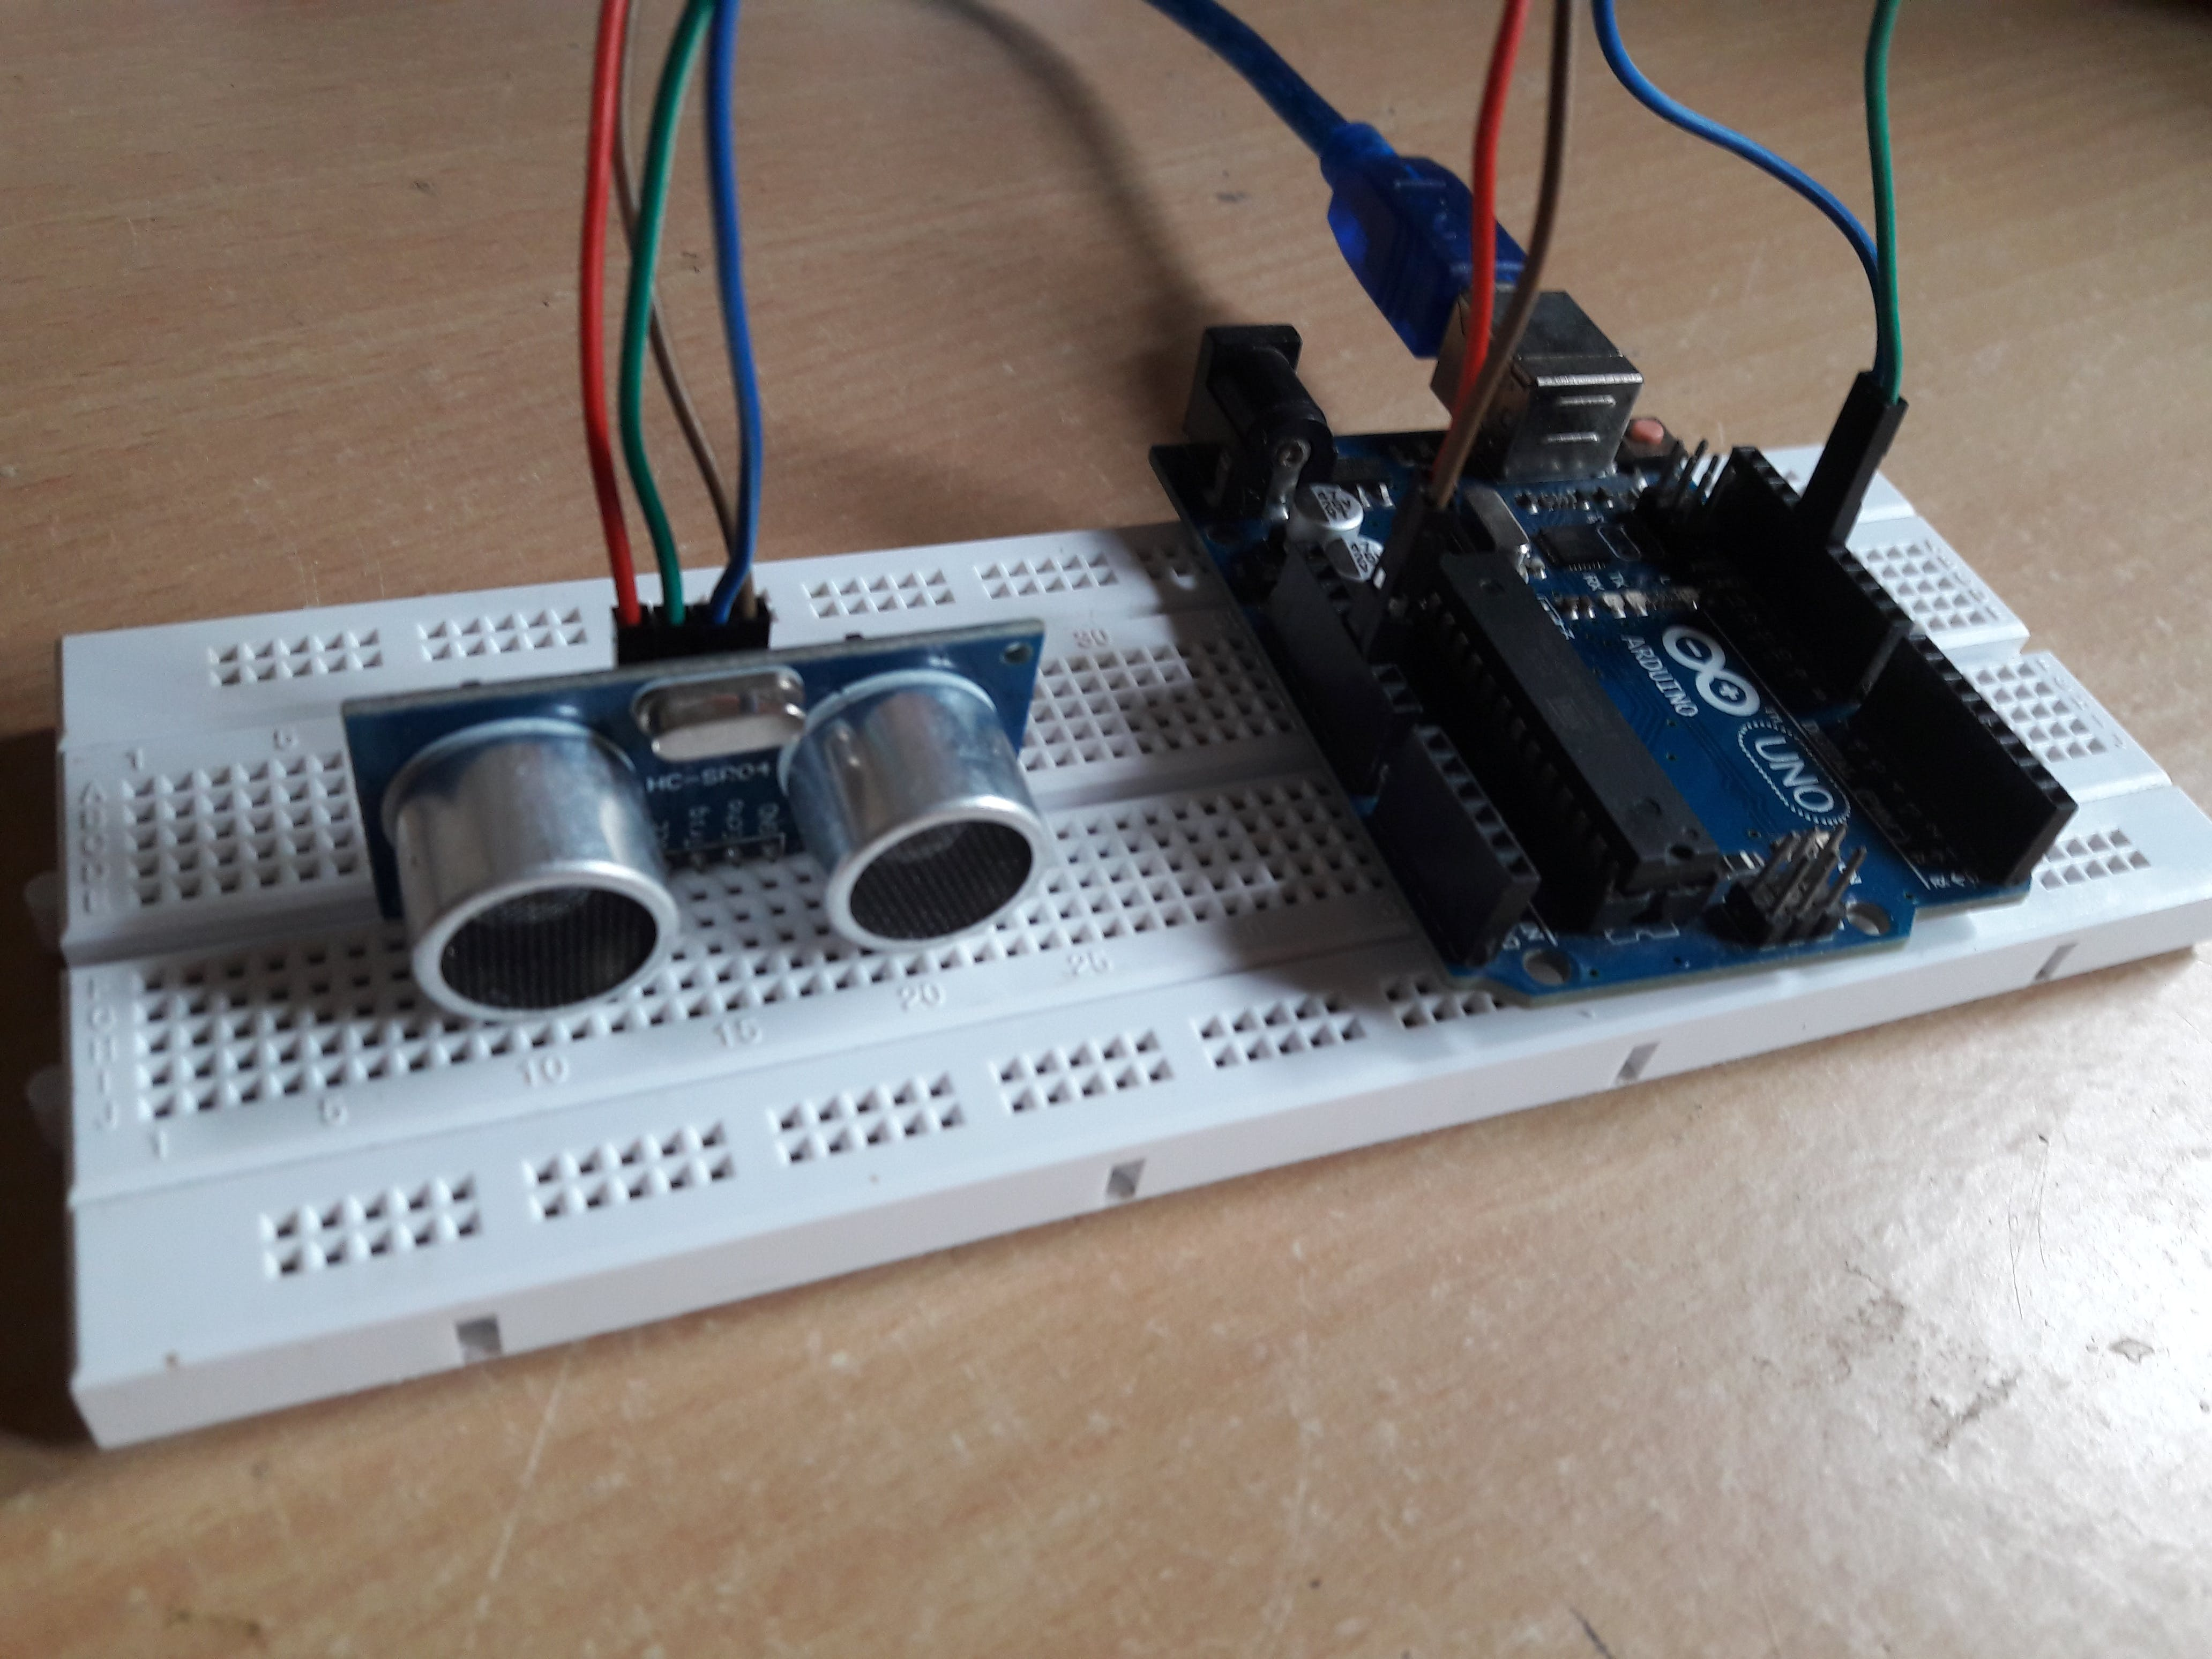 Ultrasonic Range Detector Using Arduino and SR-04F